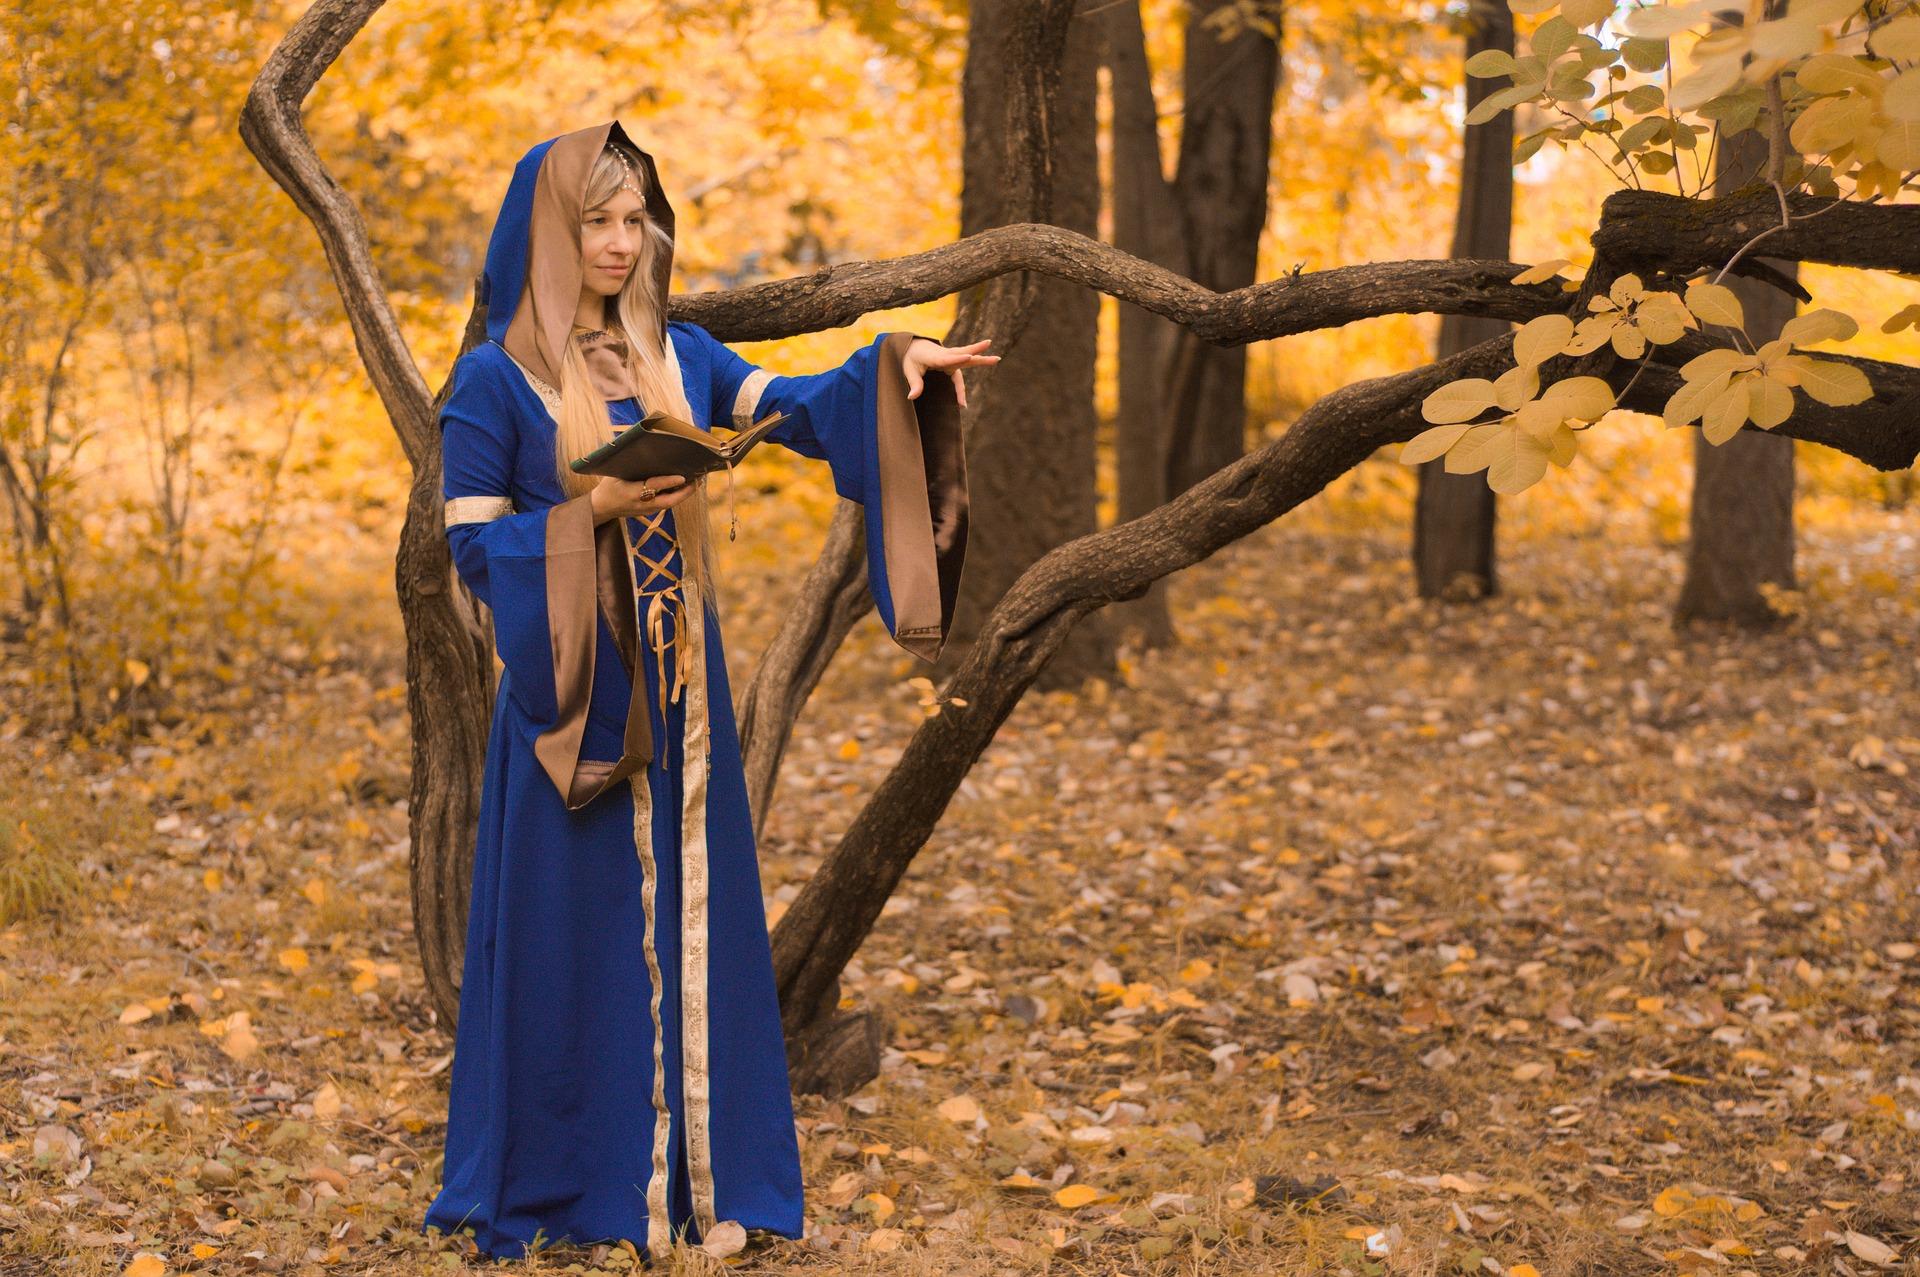 magic-druid-idromele-le-torri